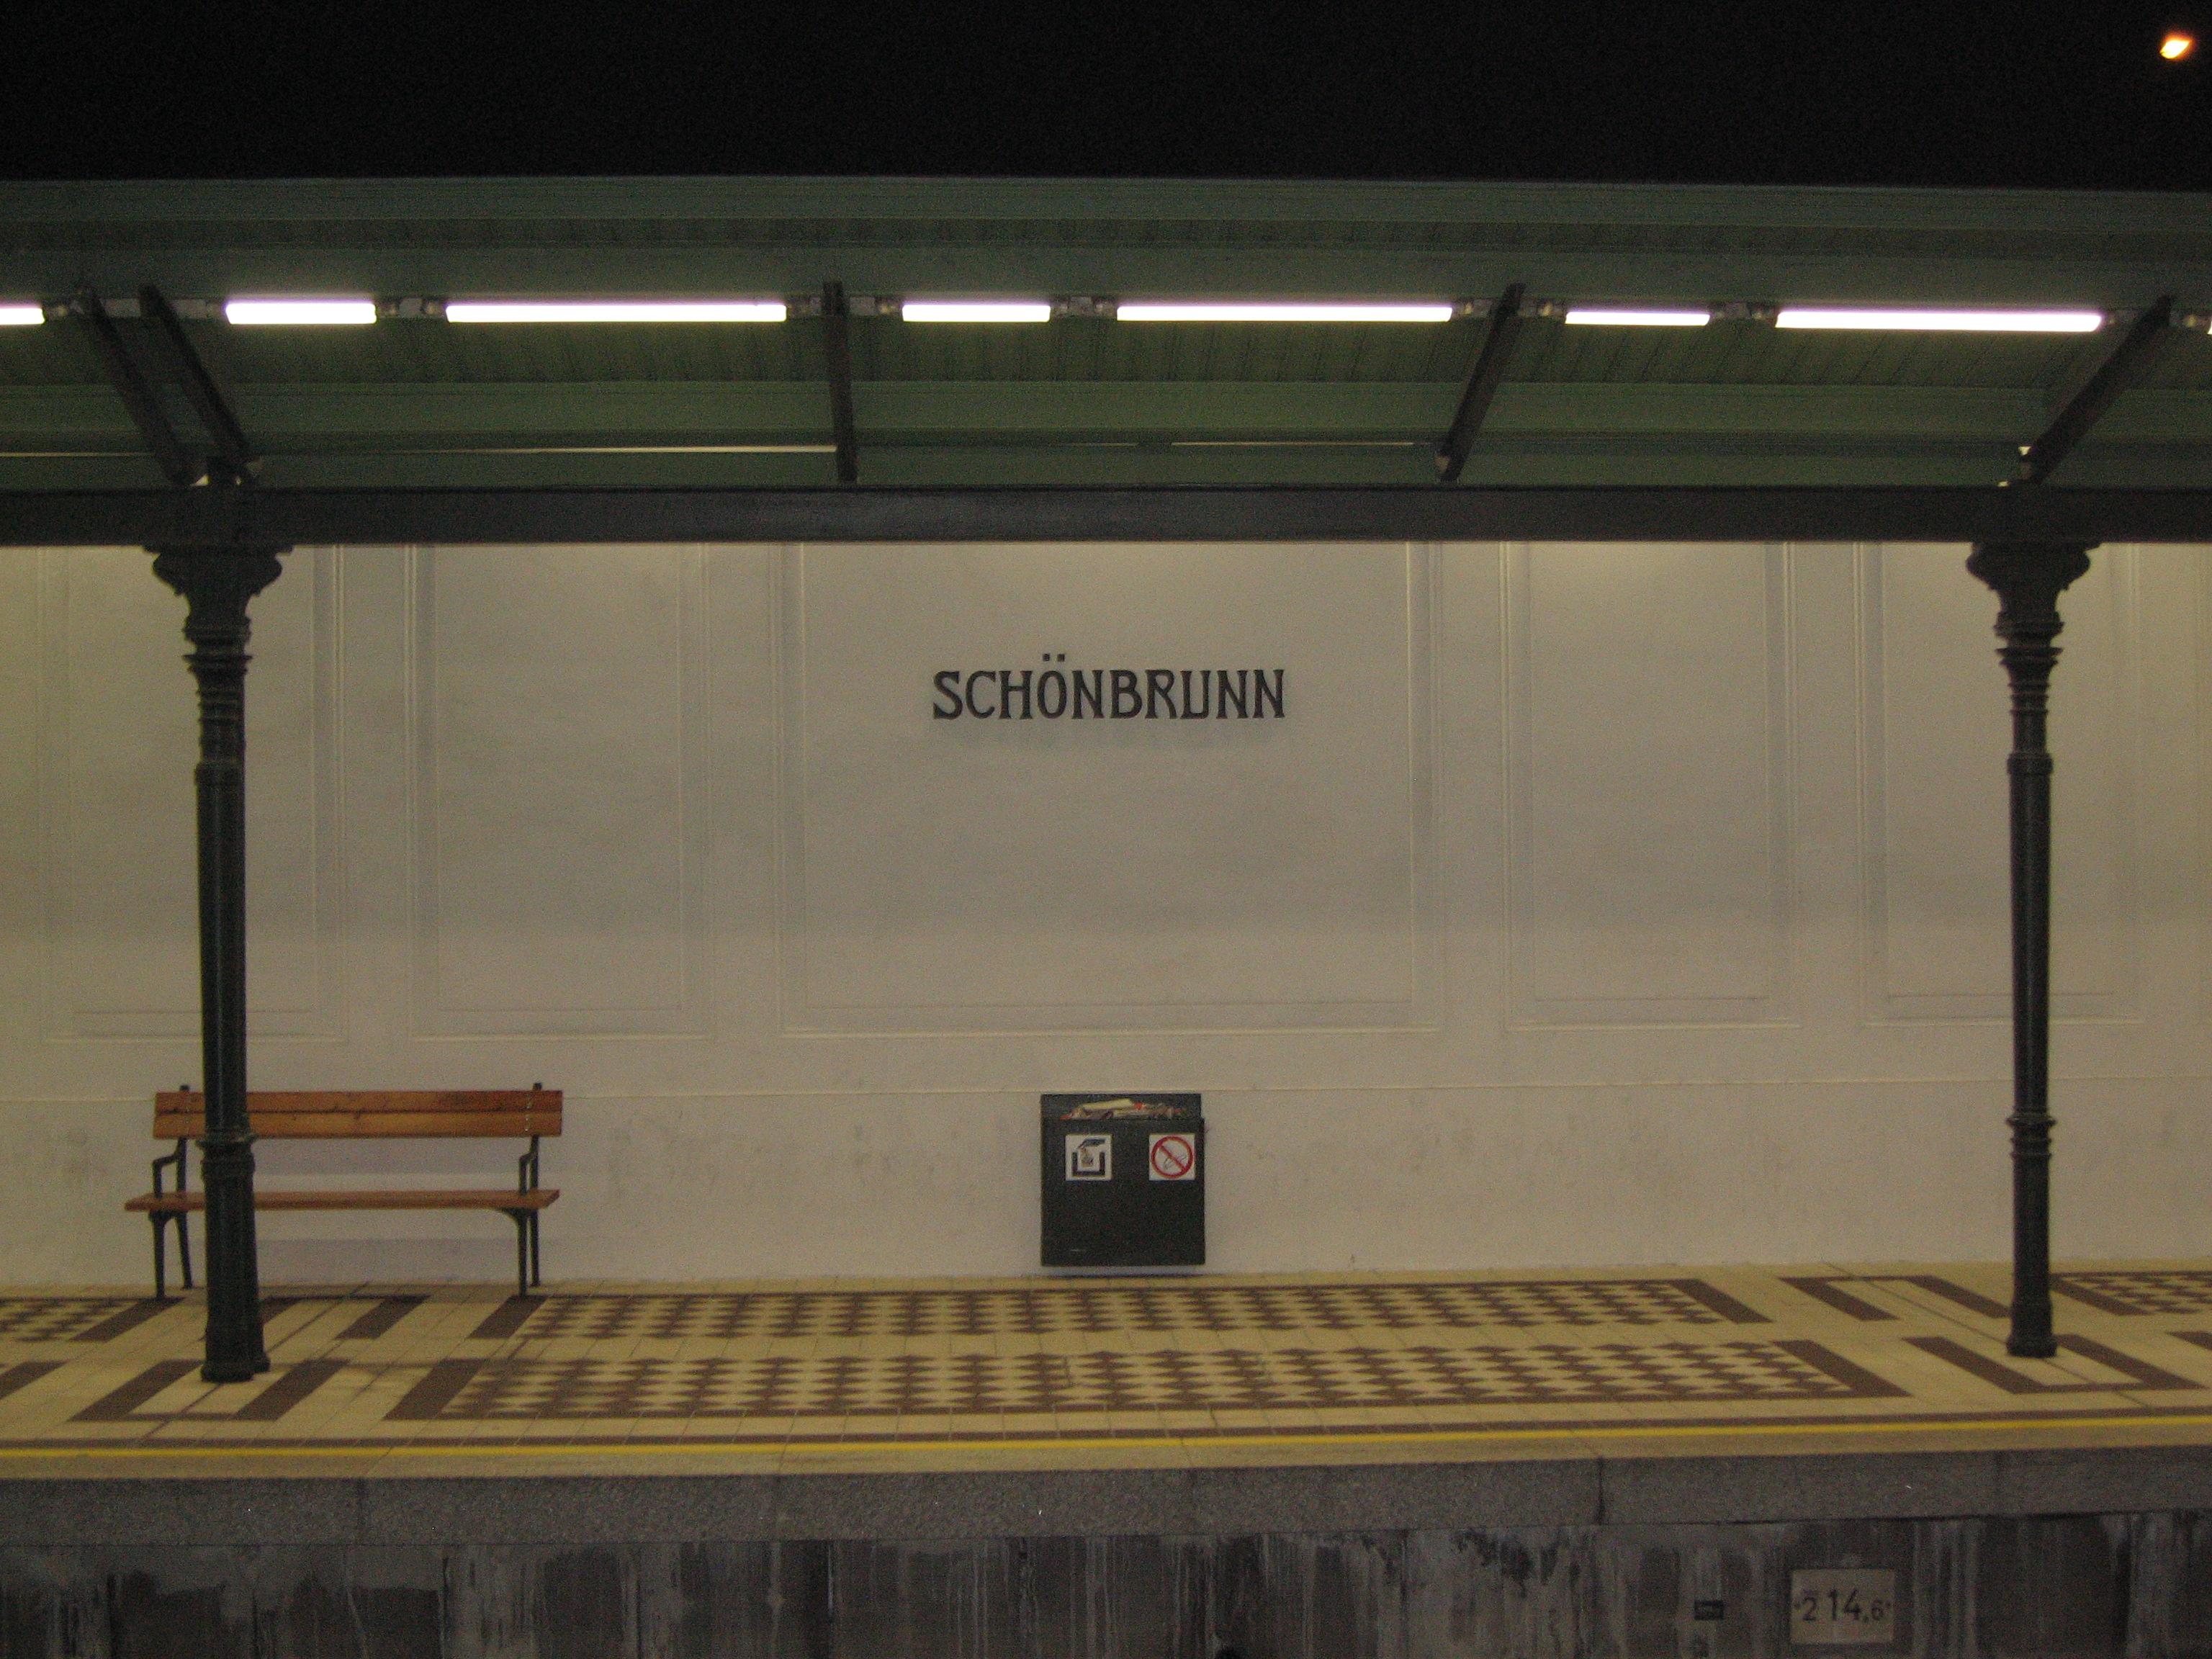 Fileunderground U4 Station Schönbrunn 6338835348jpg Wikimedia